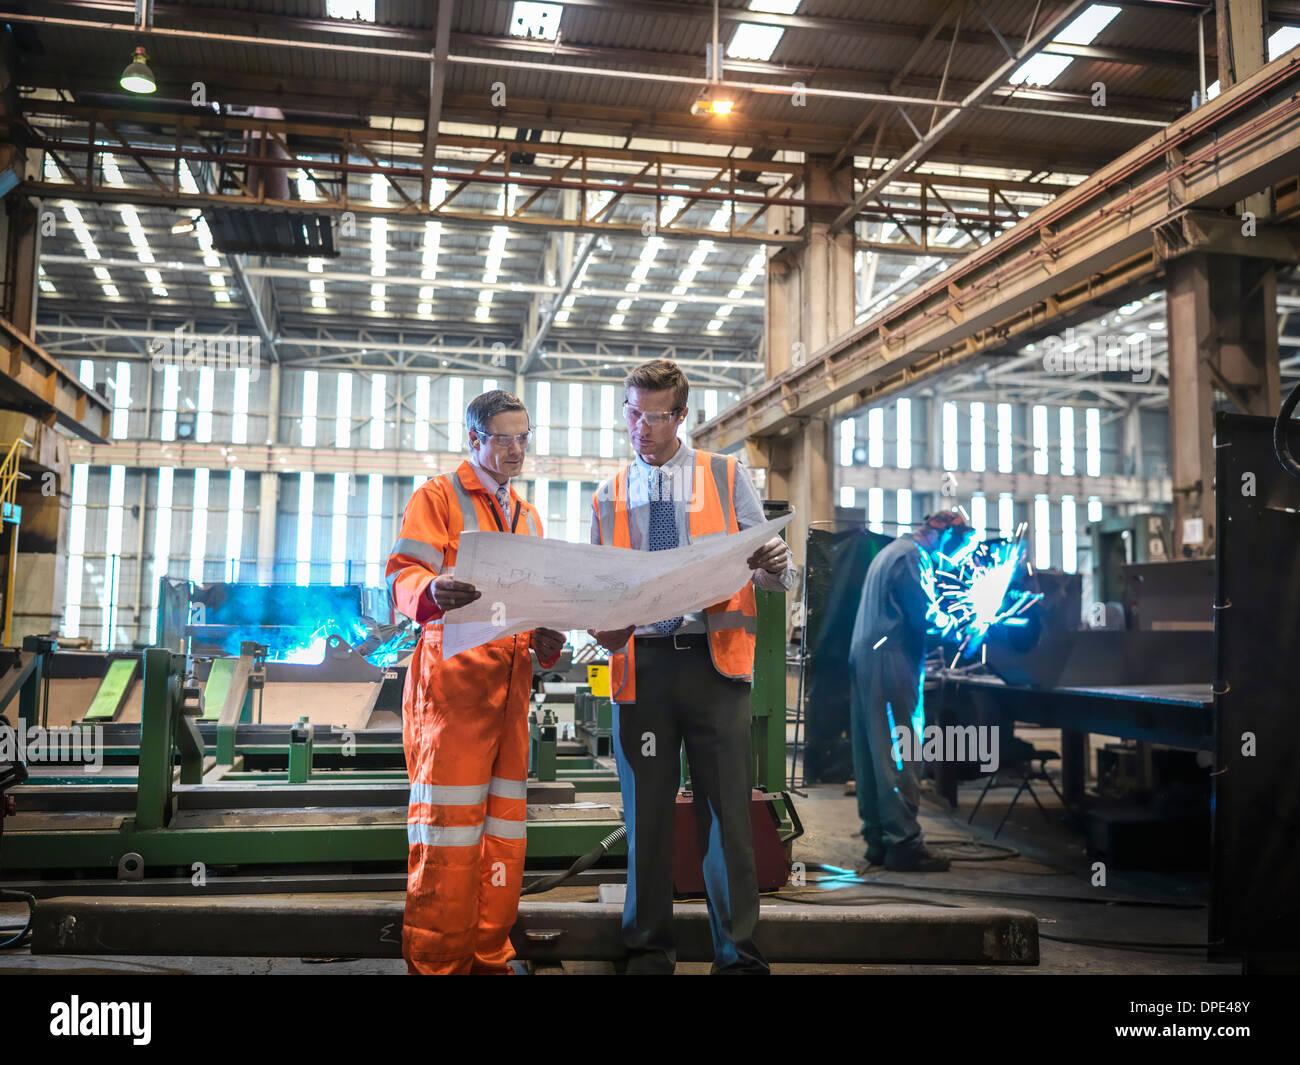 Engineers inspecting engineering drawings in factory Photo Stock